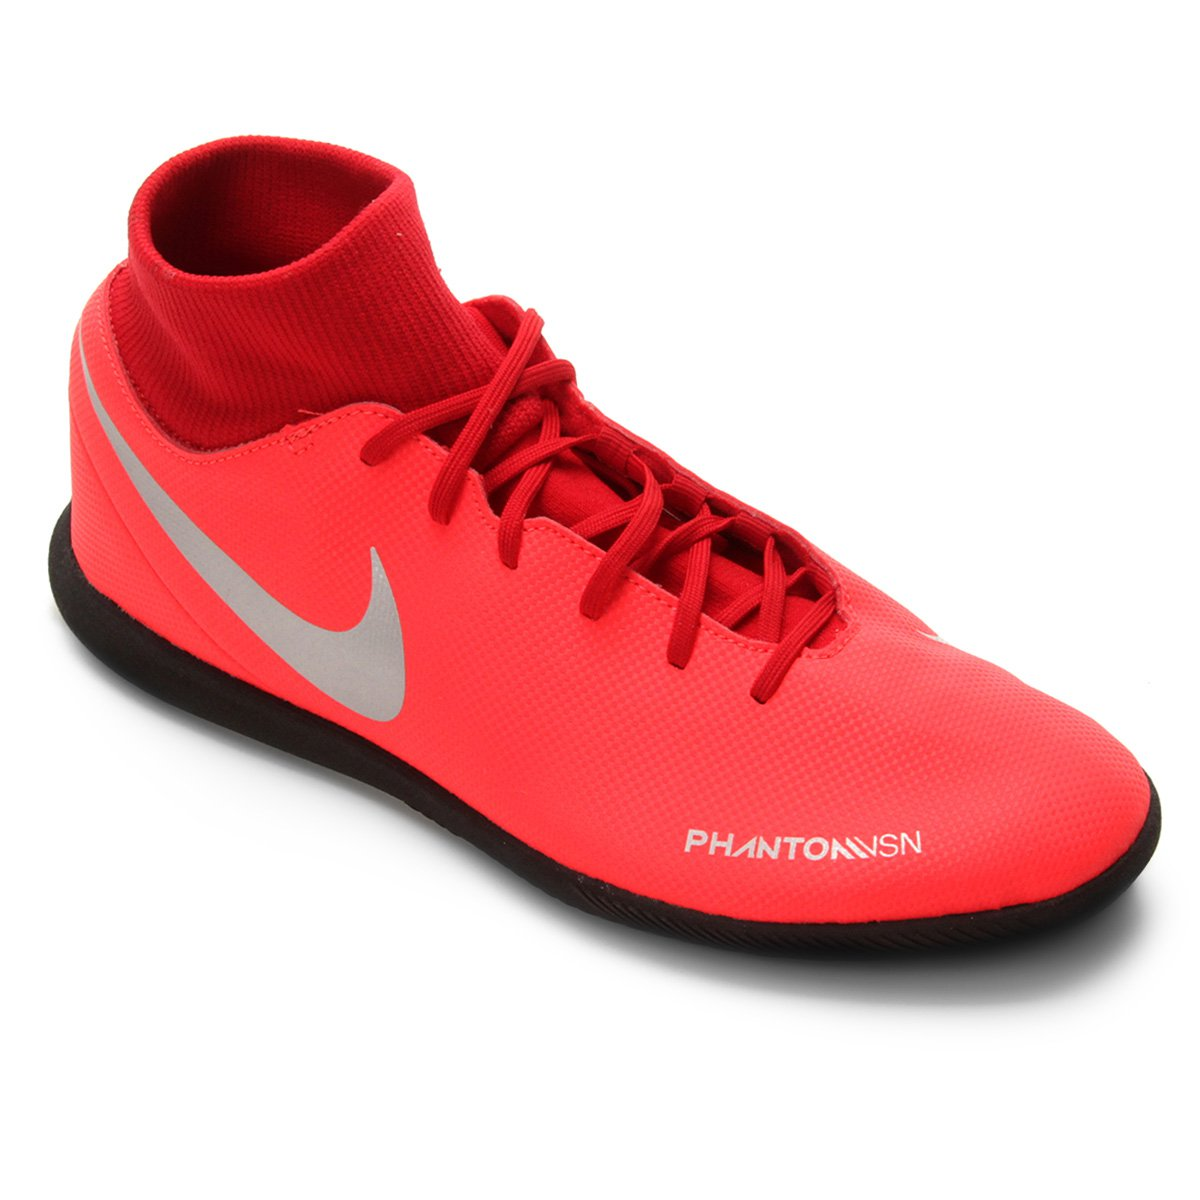 6a9373f3a8 Chuteira Futsal Nike Phantom Vision Club DF IC - Vermelho e Prata ...